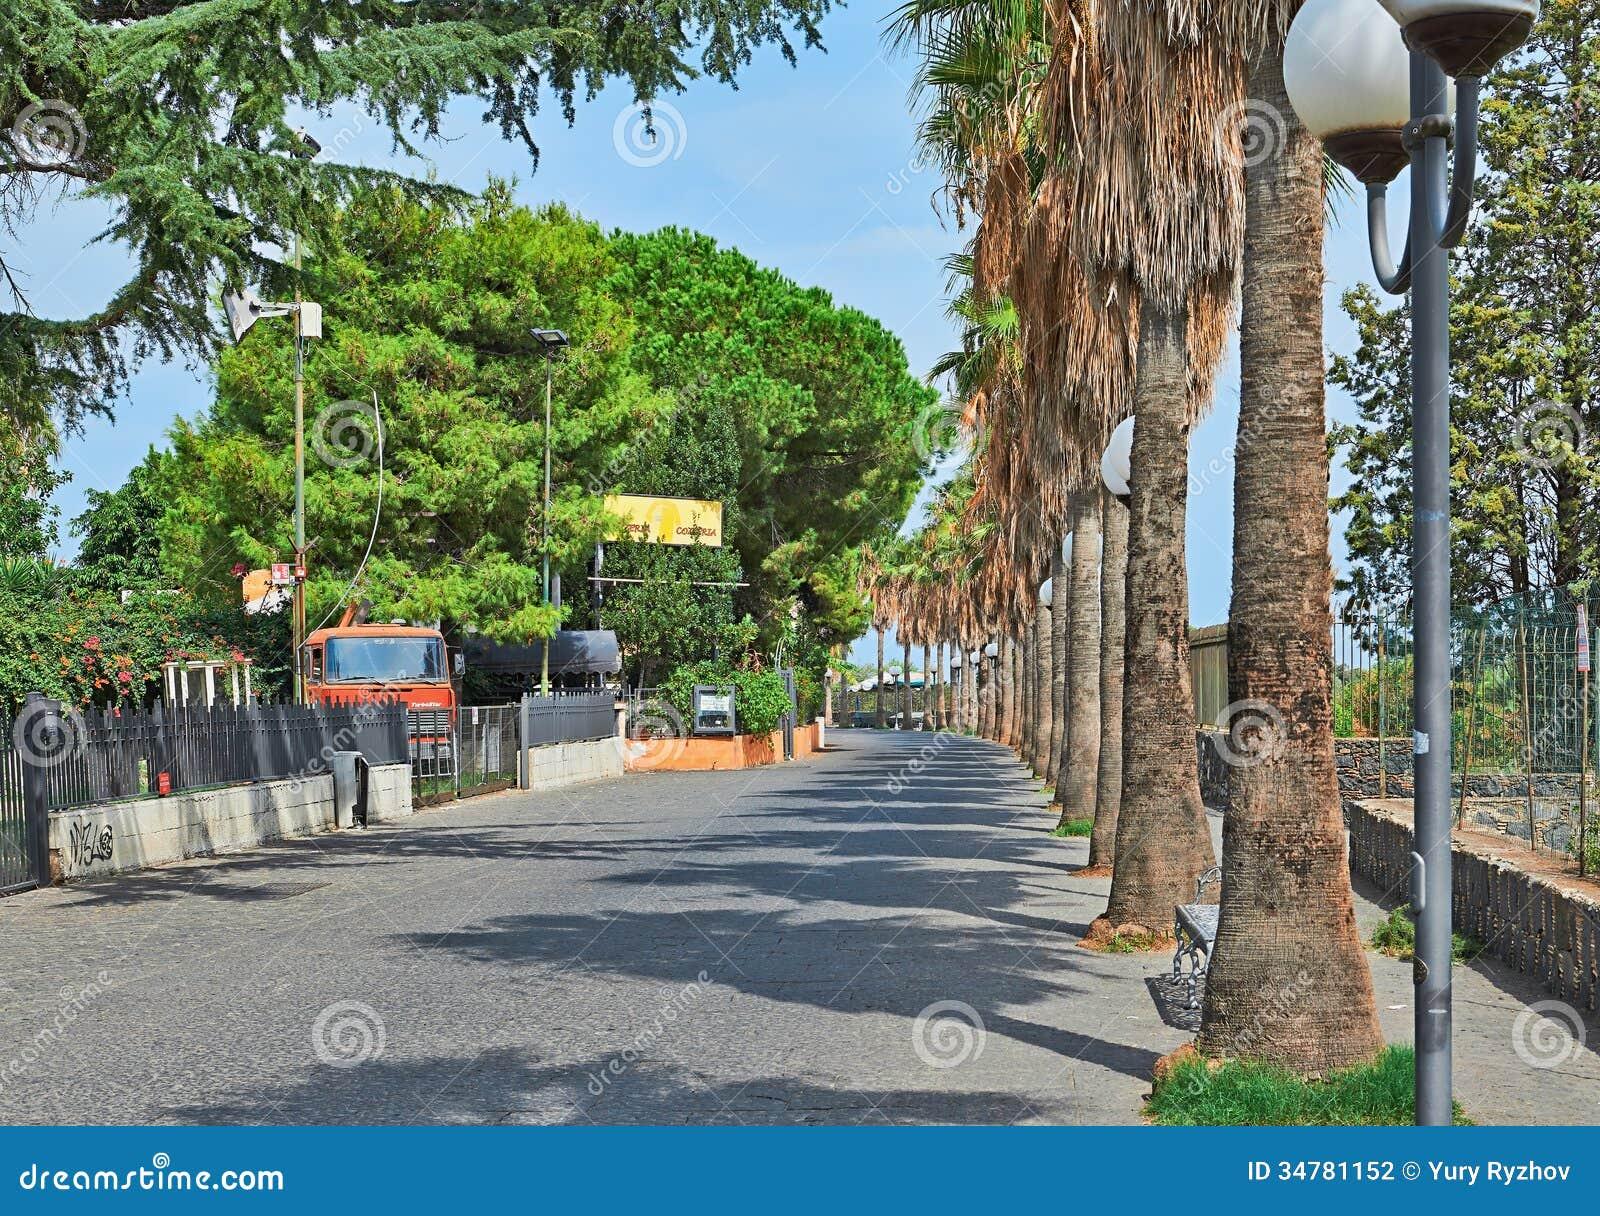 Giardini Naxos Italy  city photo : giardini naxos italy september street viale stracina giardini naxos ...